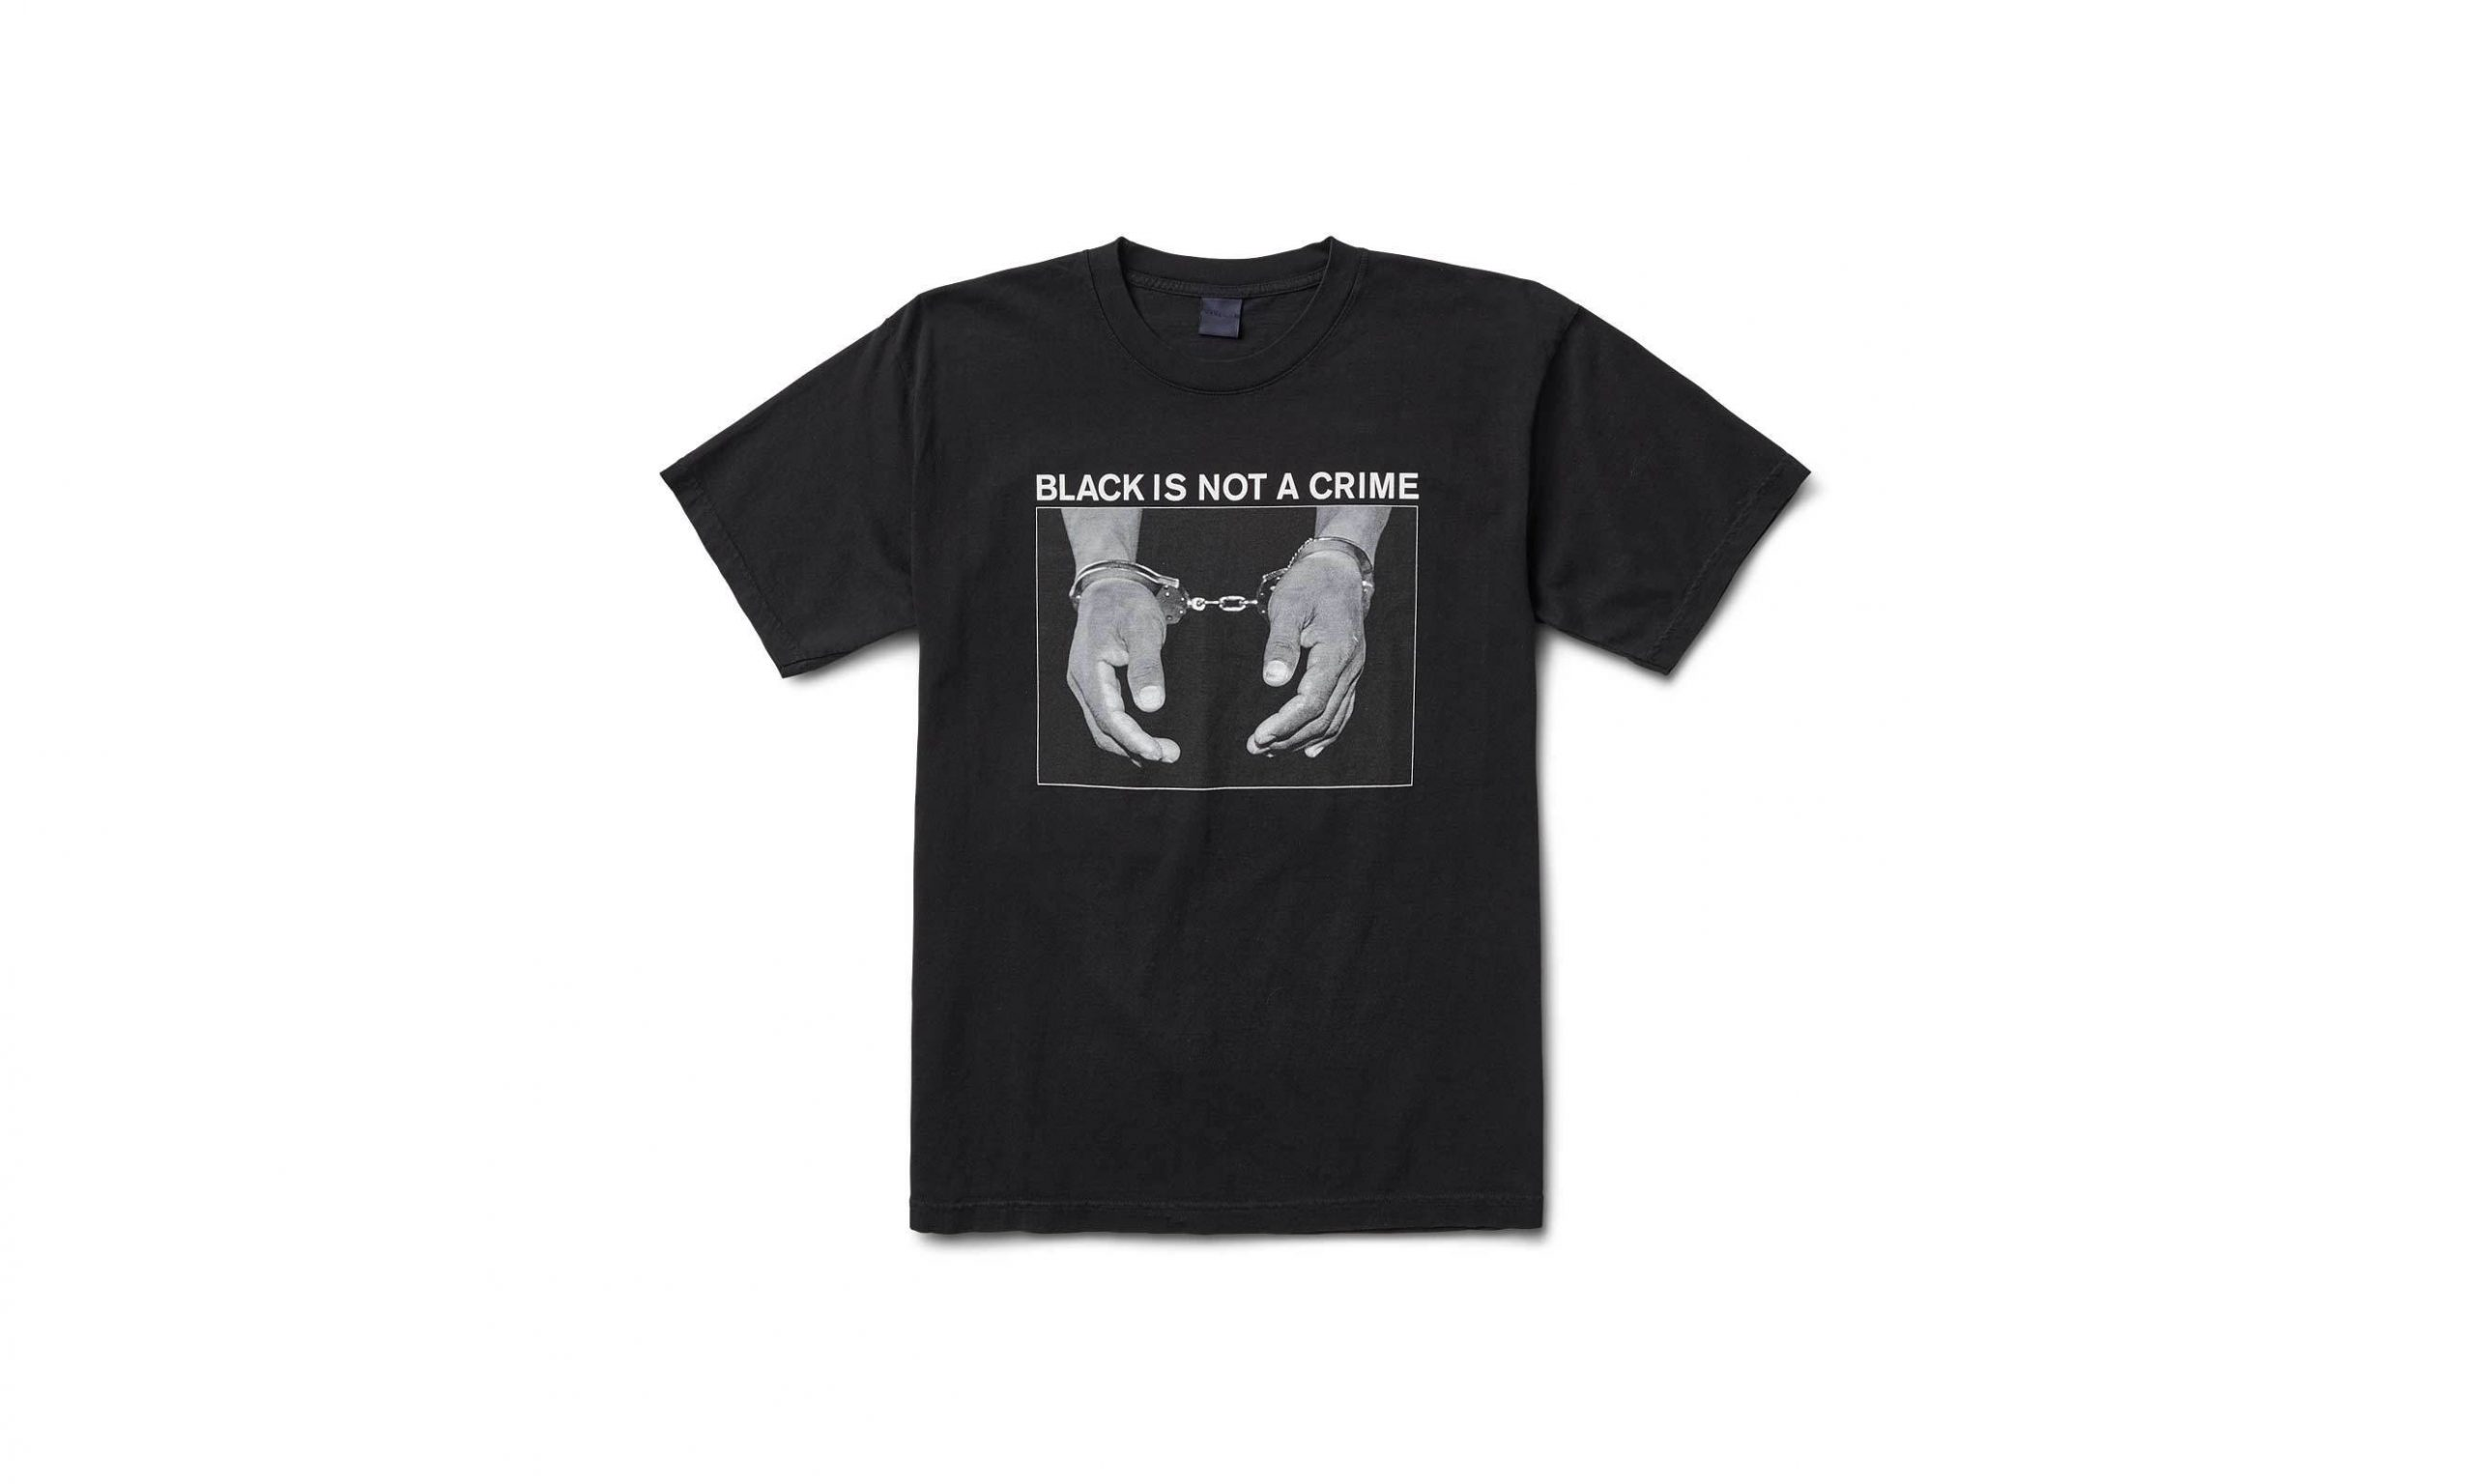 Freshjive 用新 T-Shirt 来向最近的黑人歧视案件表态